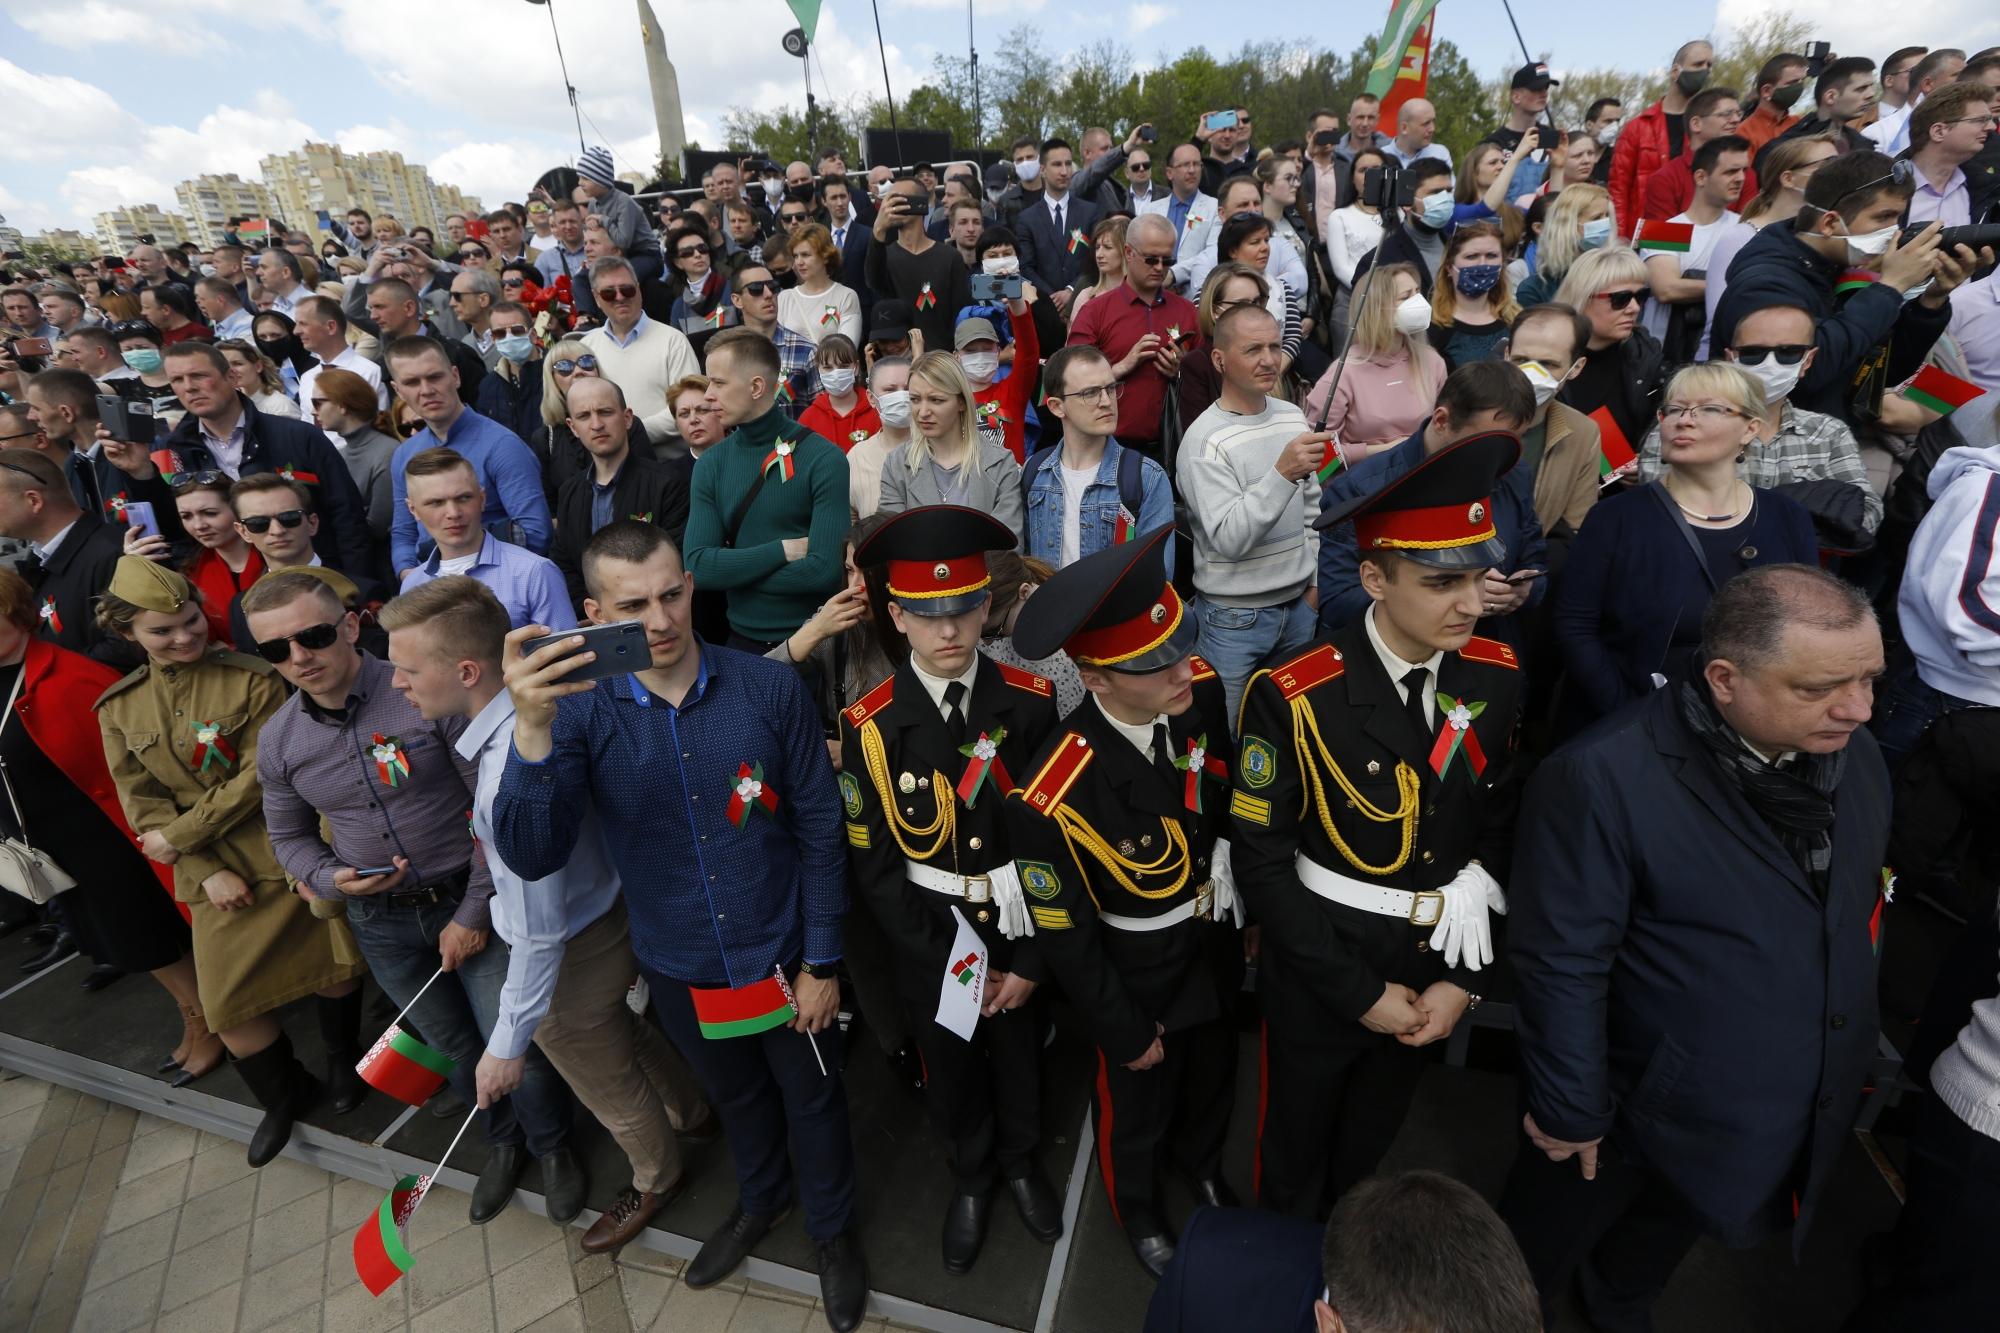 belarus - photo #24